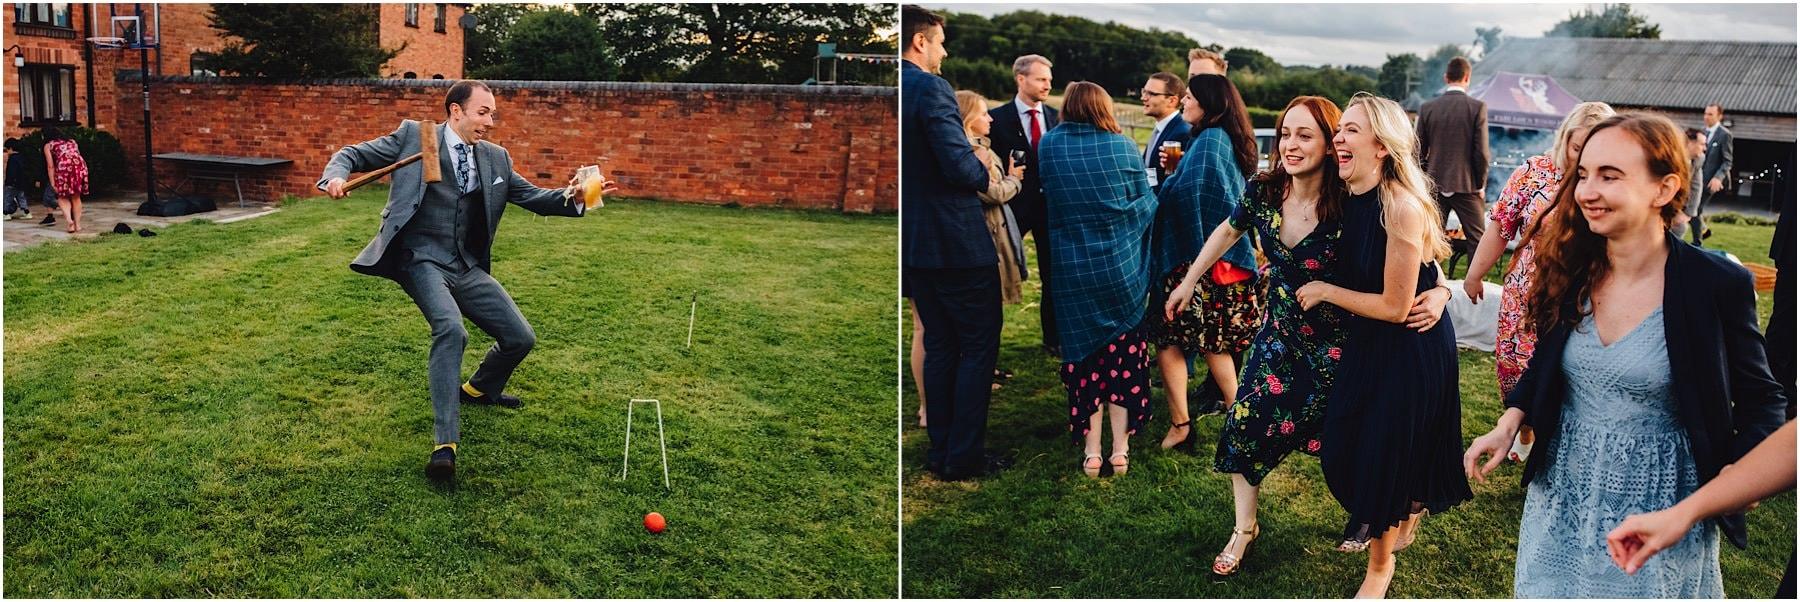 drunken wedding guests having a good time